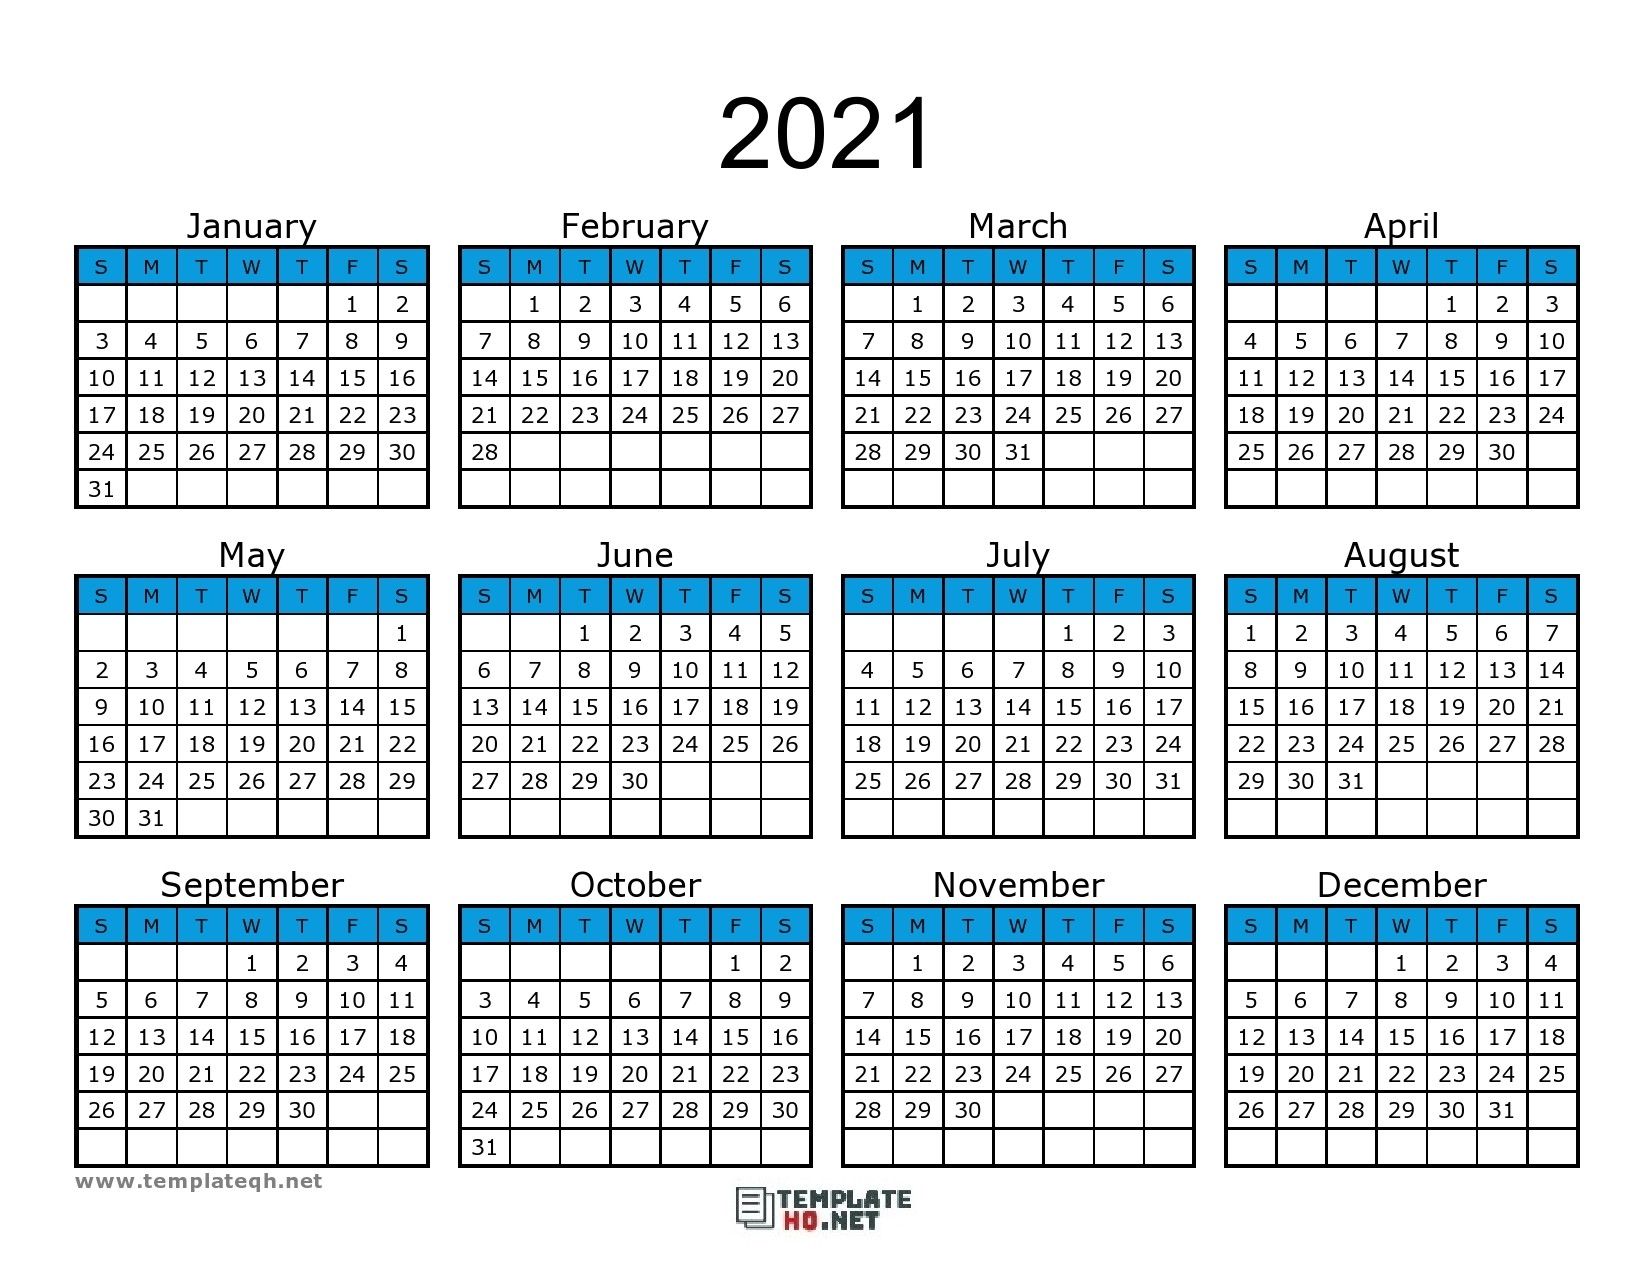 Free 2021 Calendar Printable - Template Hq-2021 Calendar Printable